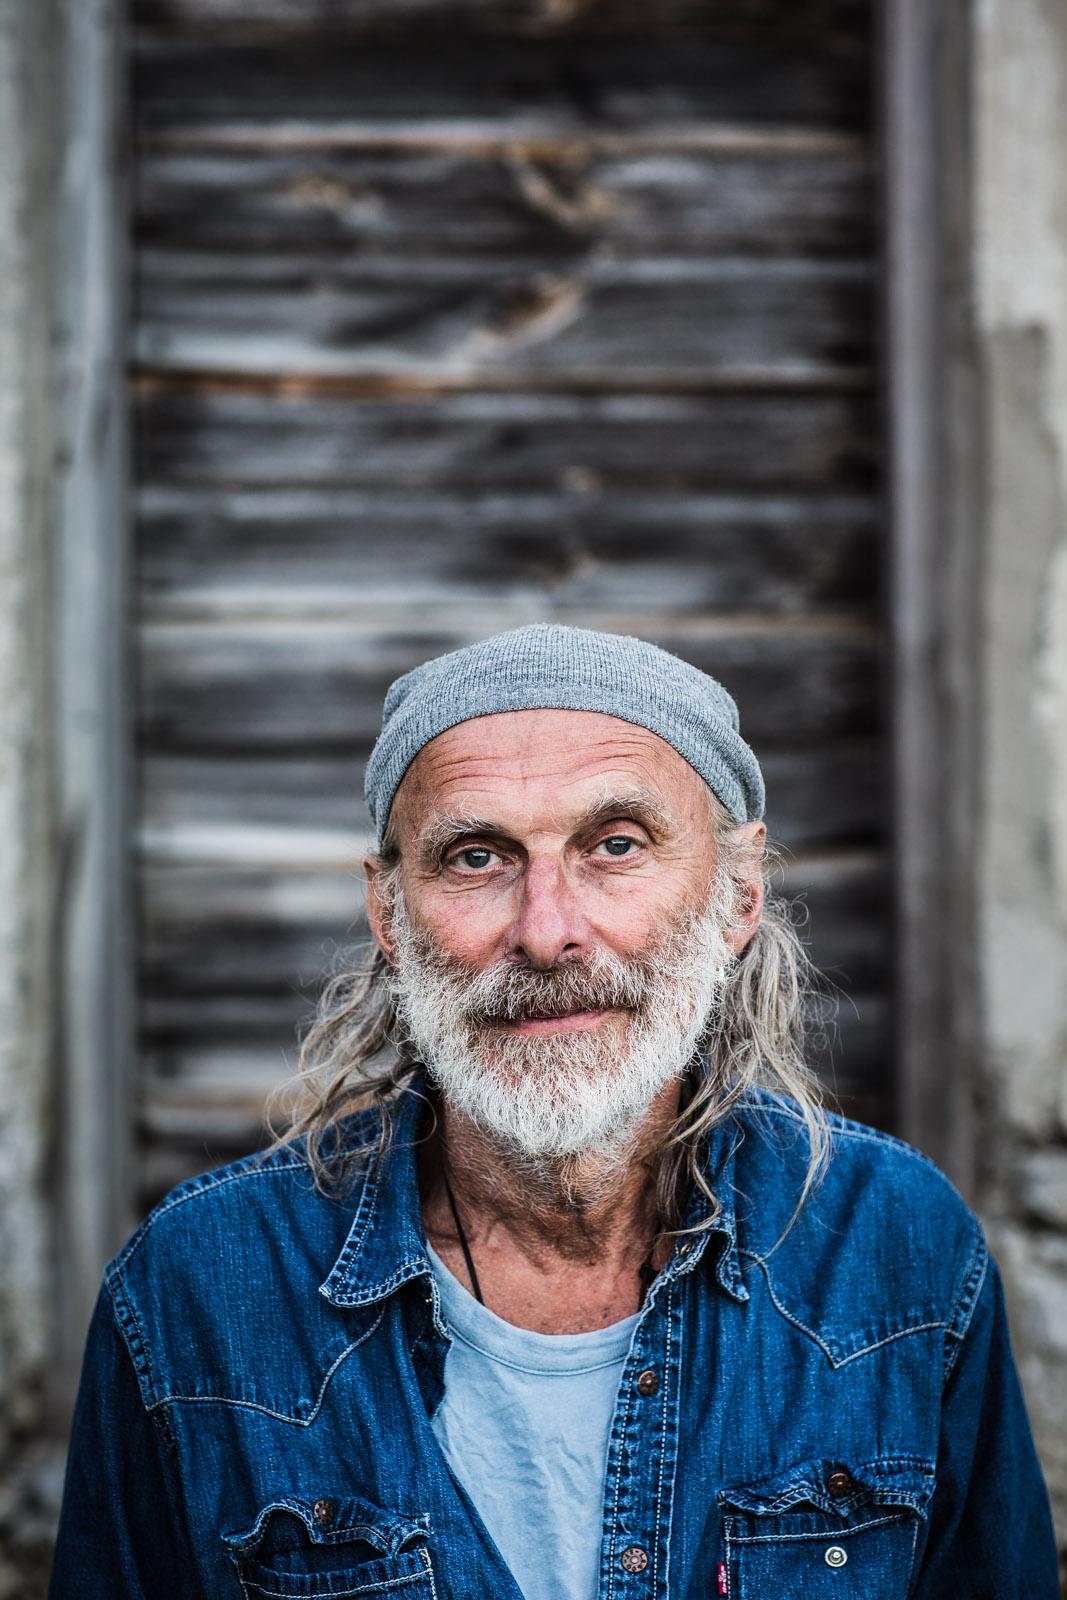 Bengan - Portrait photographer - Porträttfotograf - Lifestyle photographer - Lifestylefotograf